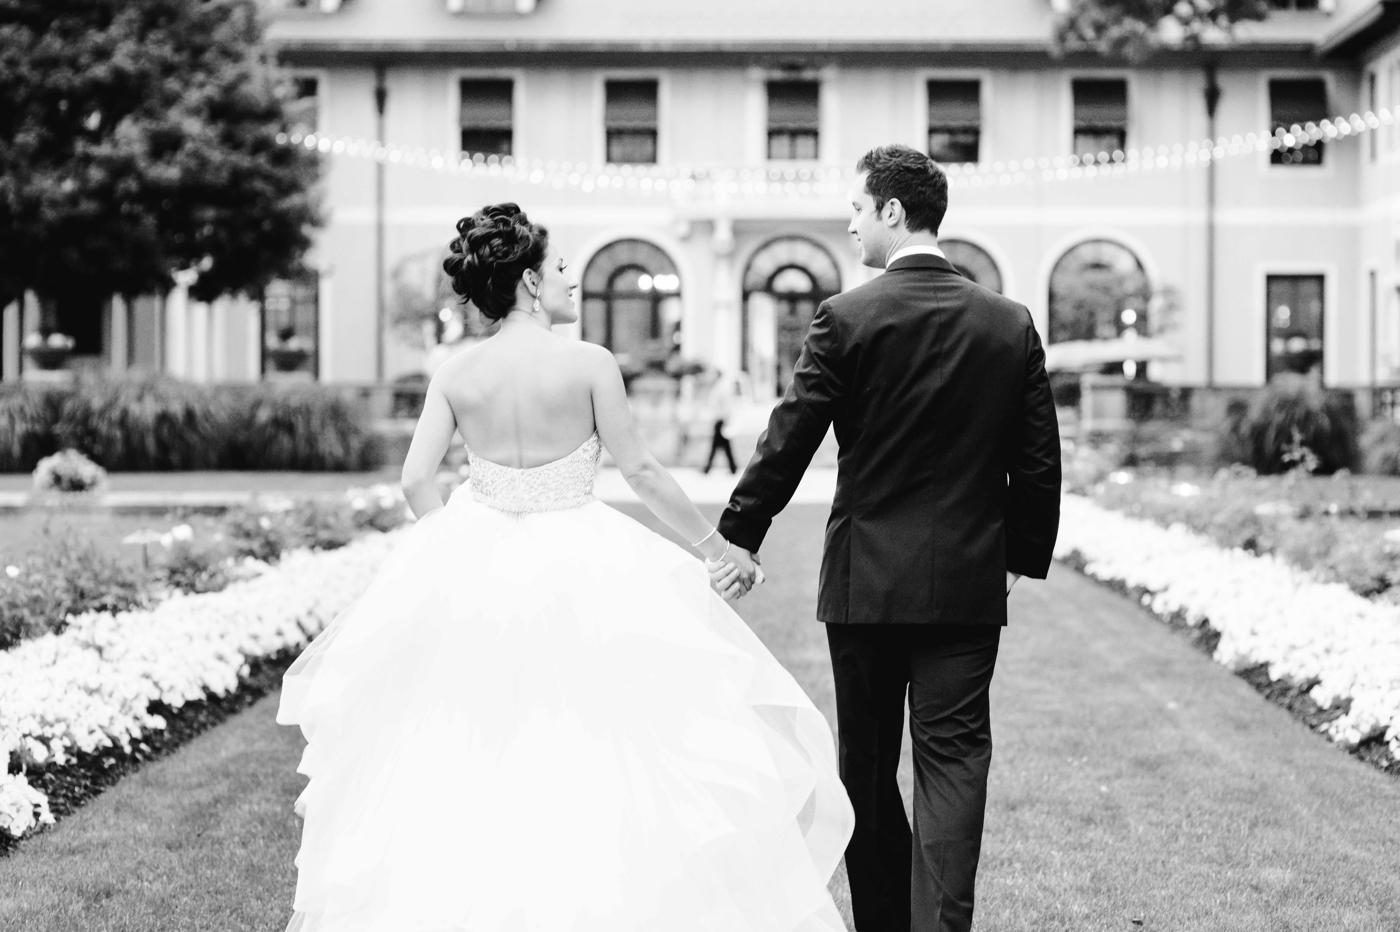 chicago-fine-art-wedding-photography-smeja45